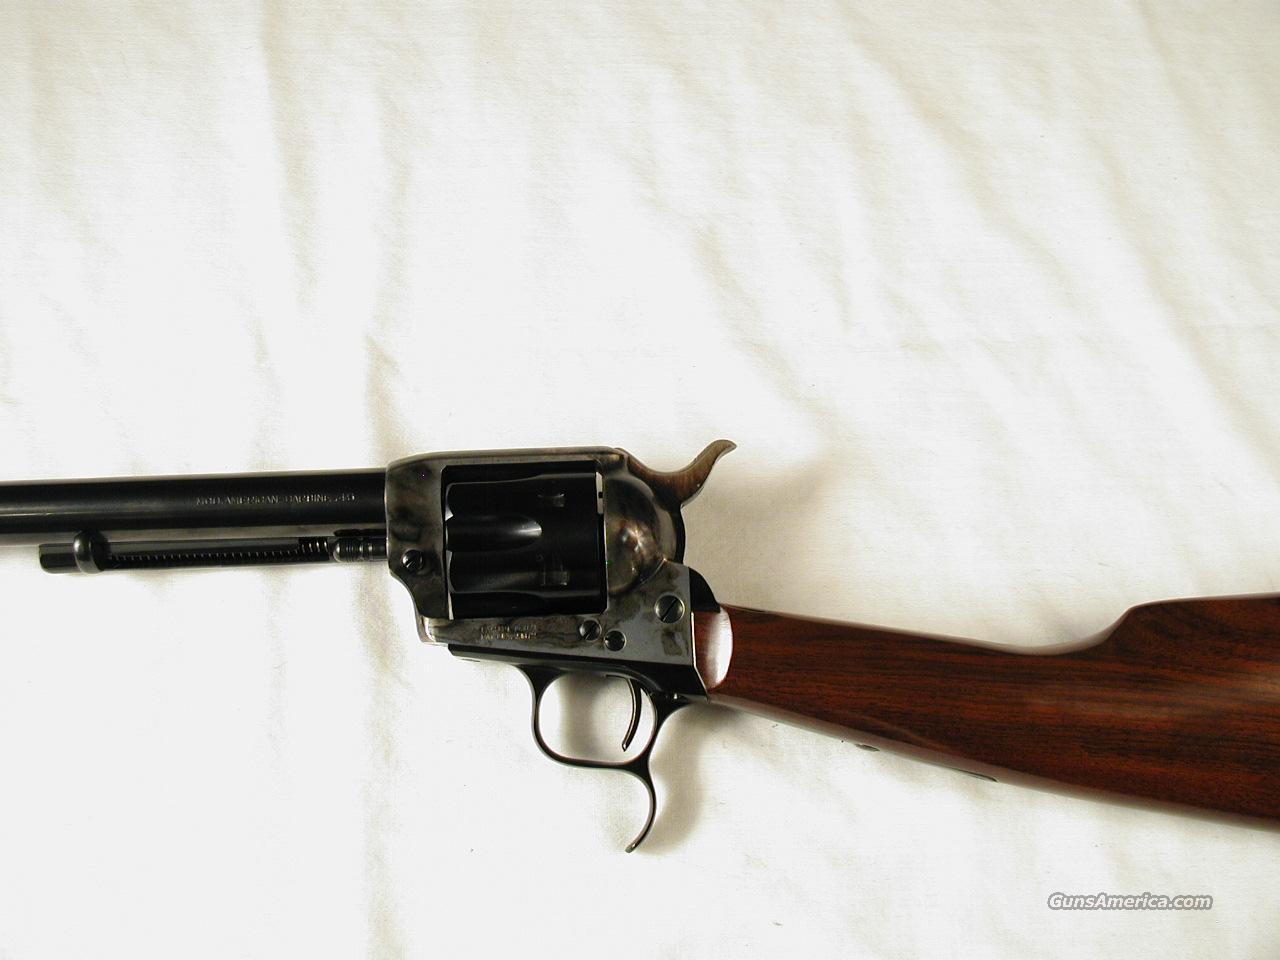 1873 REVOLVING CARBINE  Guns > Rifles > Uberti Rifles > Lever Action